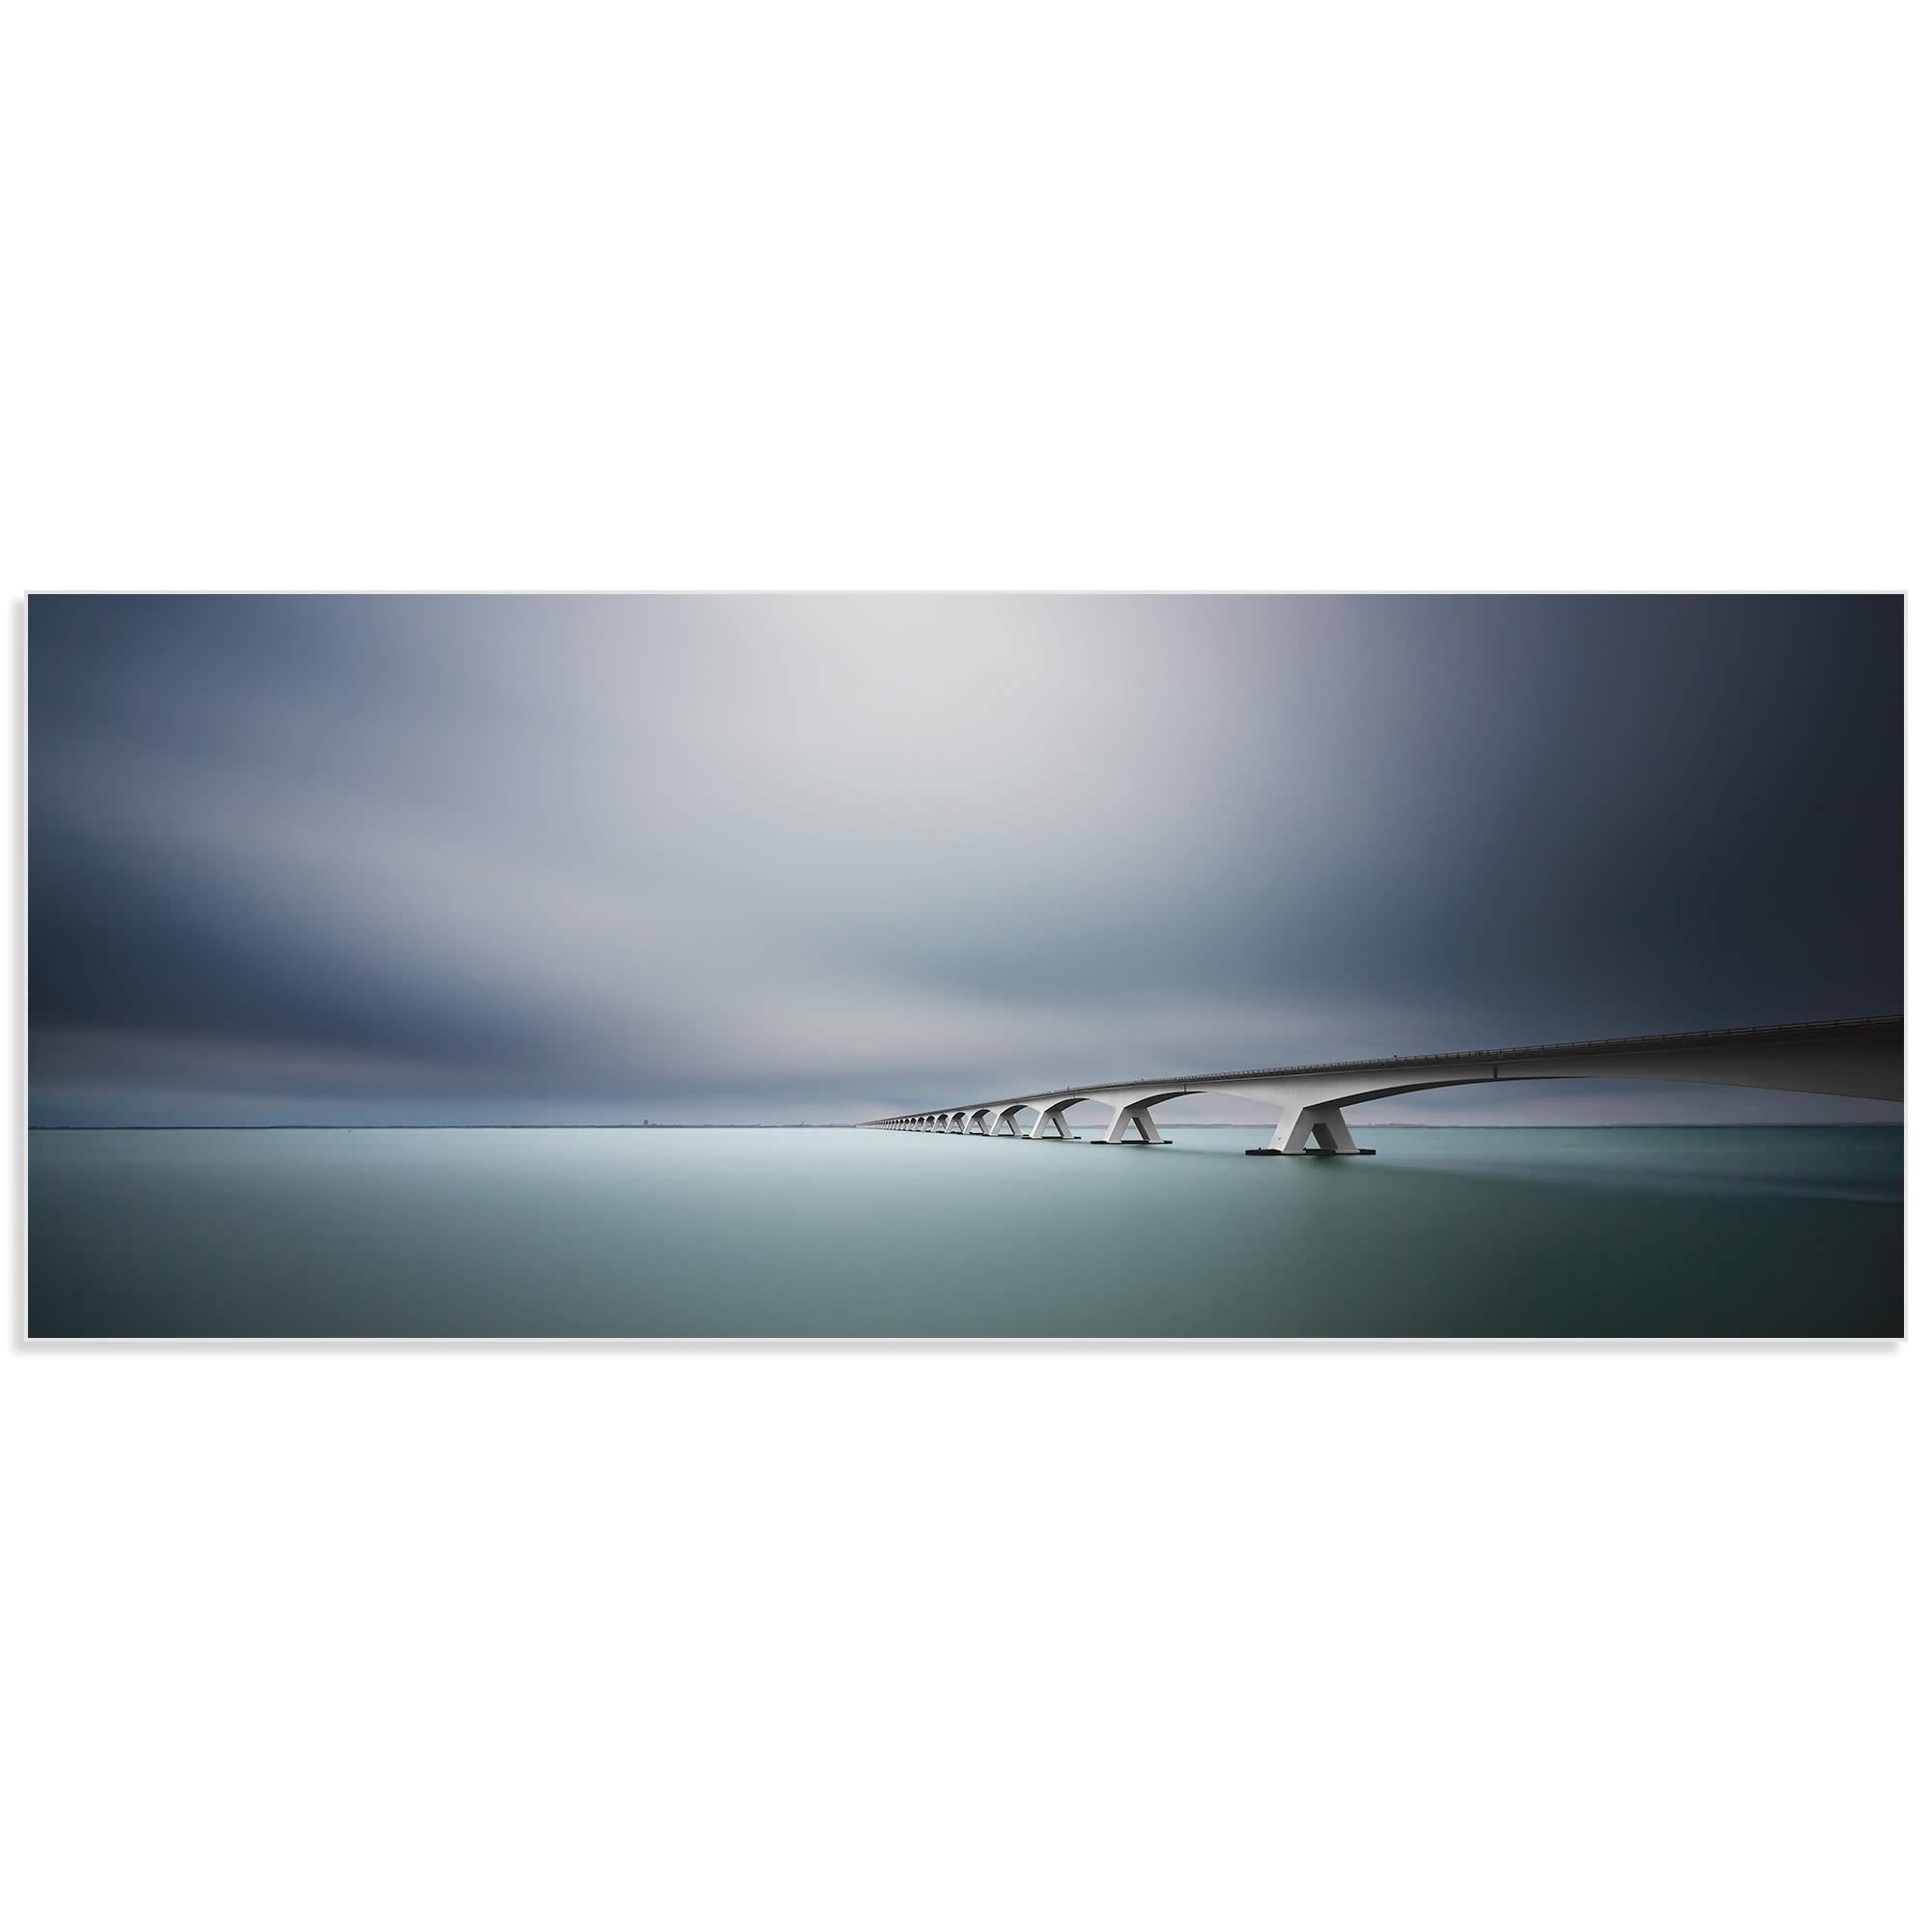 The Infinite Bridge by Arthur van Orden - Bridge Art on Metal or Acrylic - Alternate View 2